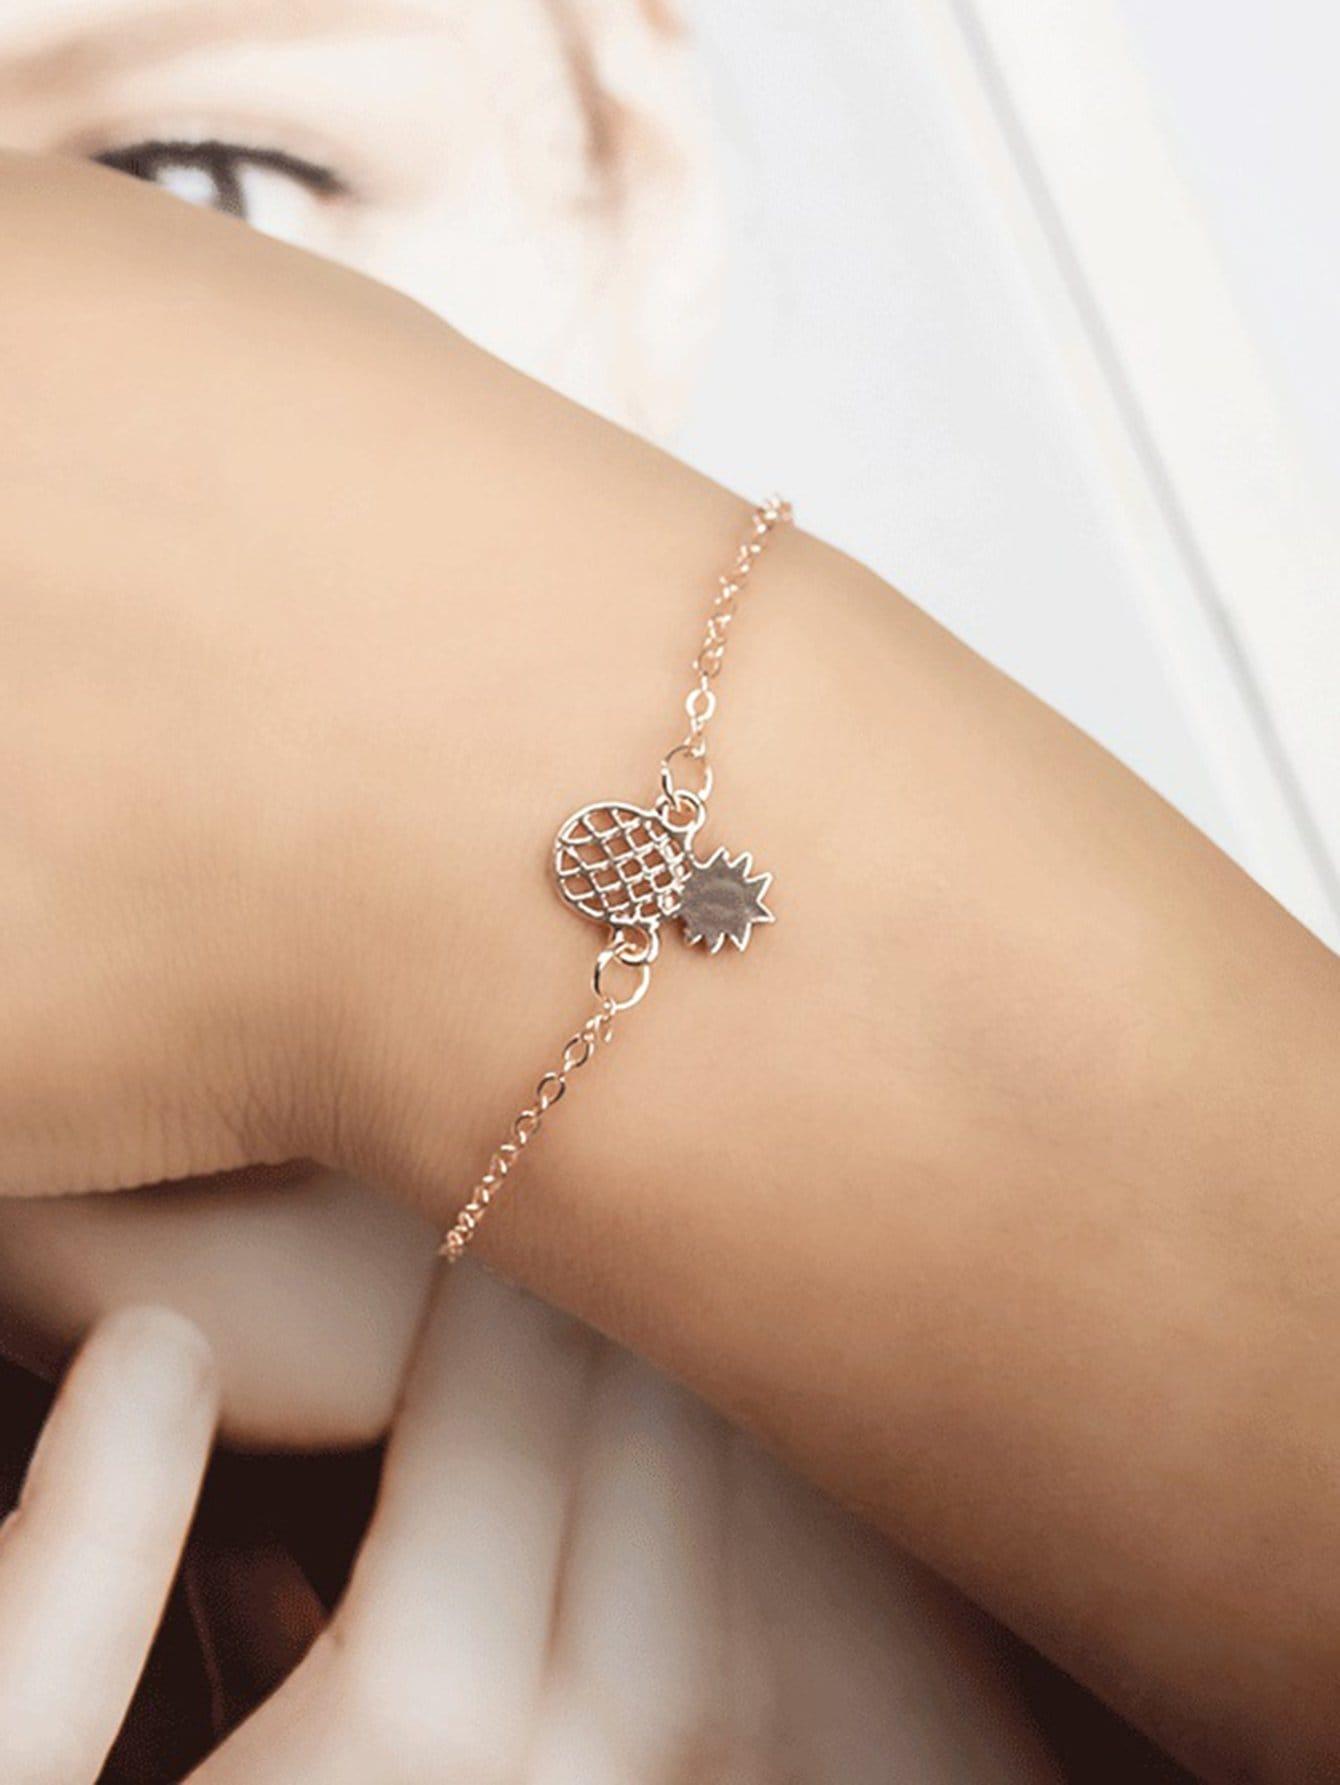 Kette Armband mit ausgehöhltem Ananas Anhänger